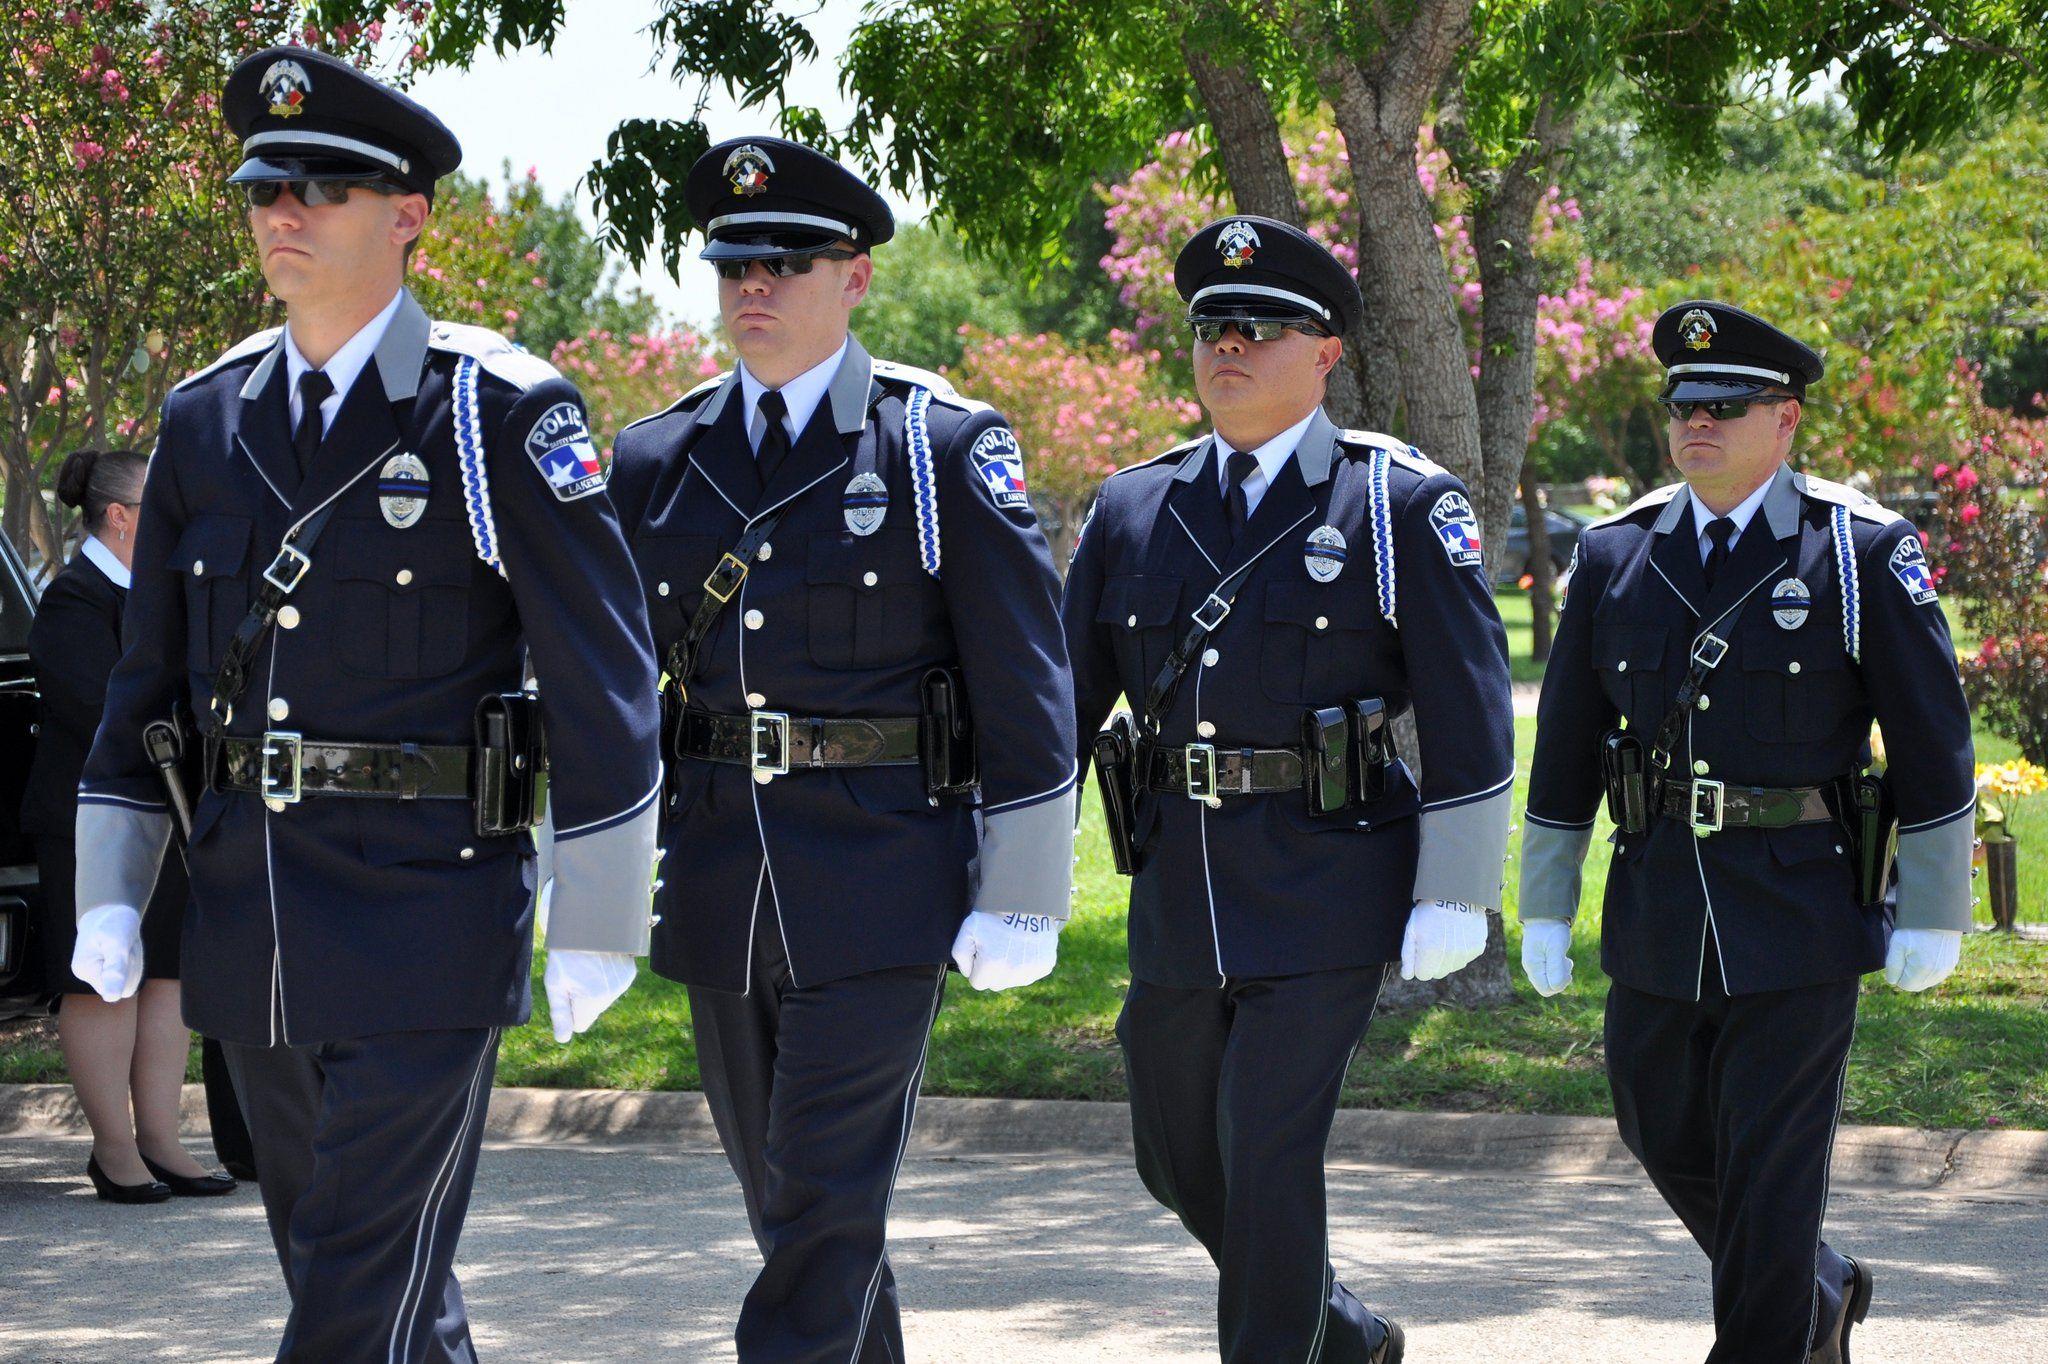 International company selects lakeway honor guard uniform